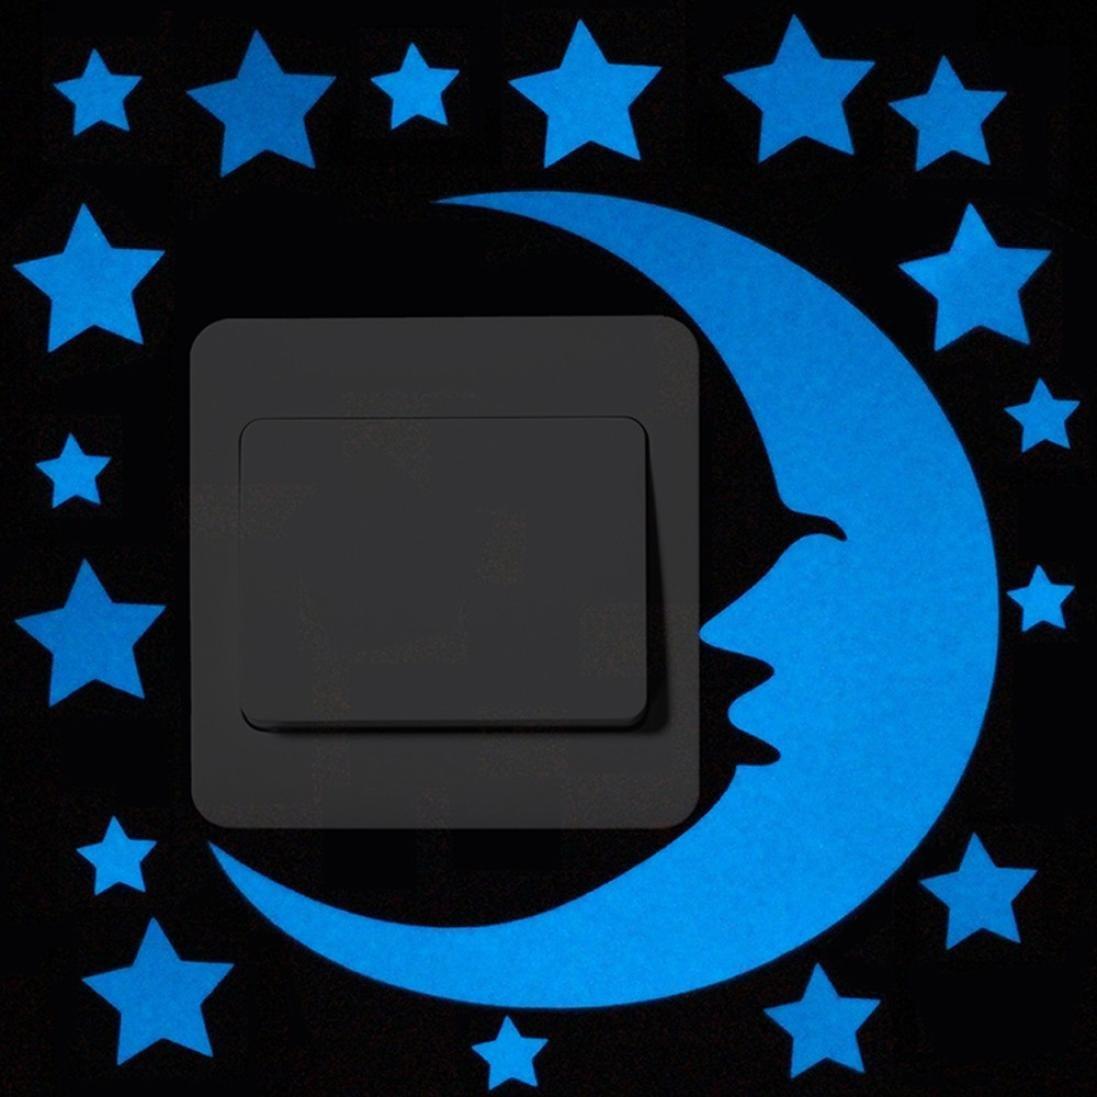 Home Decor, Rumas Fashion Cute Cartoon Switch Luminous Fluorescent Wall Sticker Removable Sticker (D)